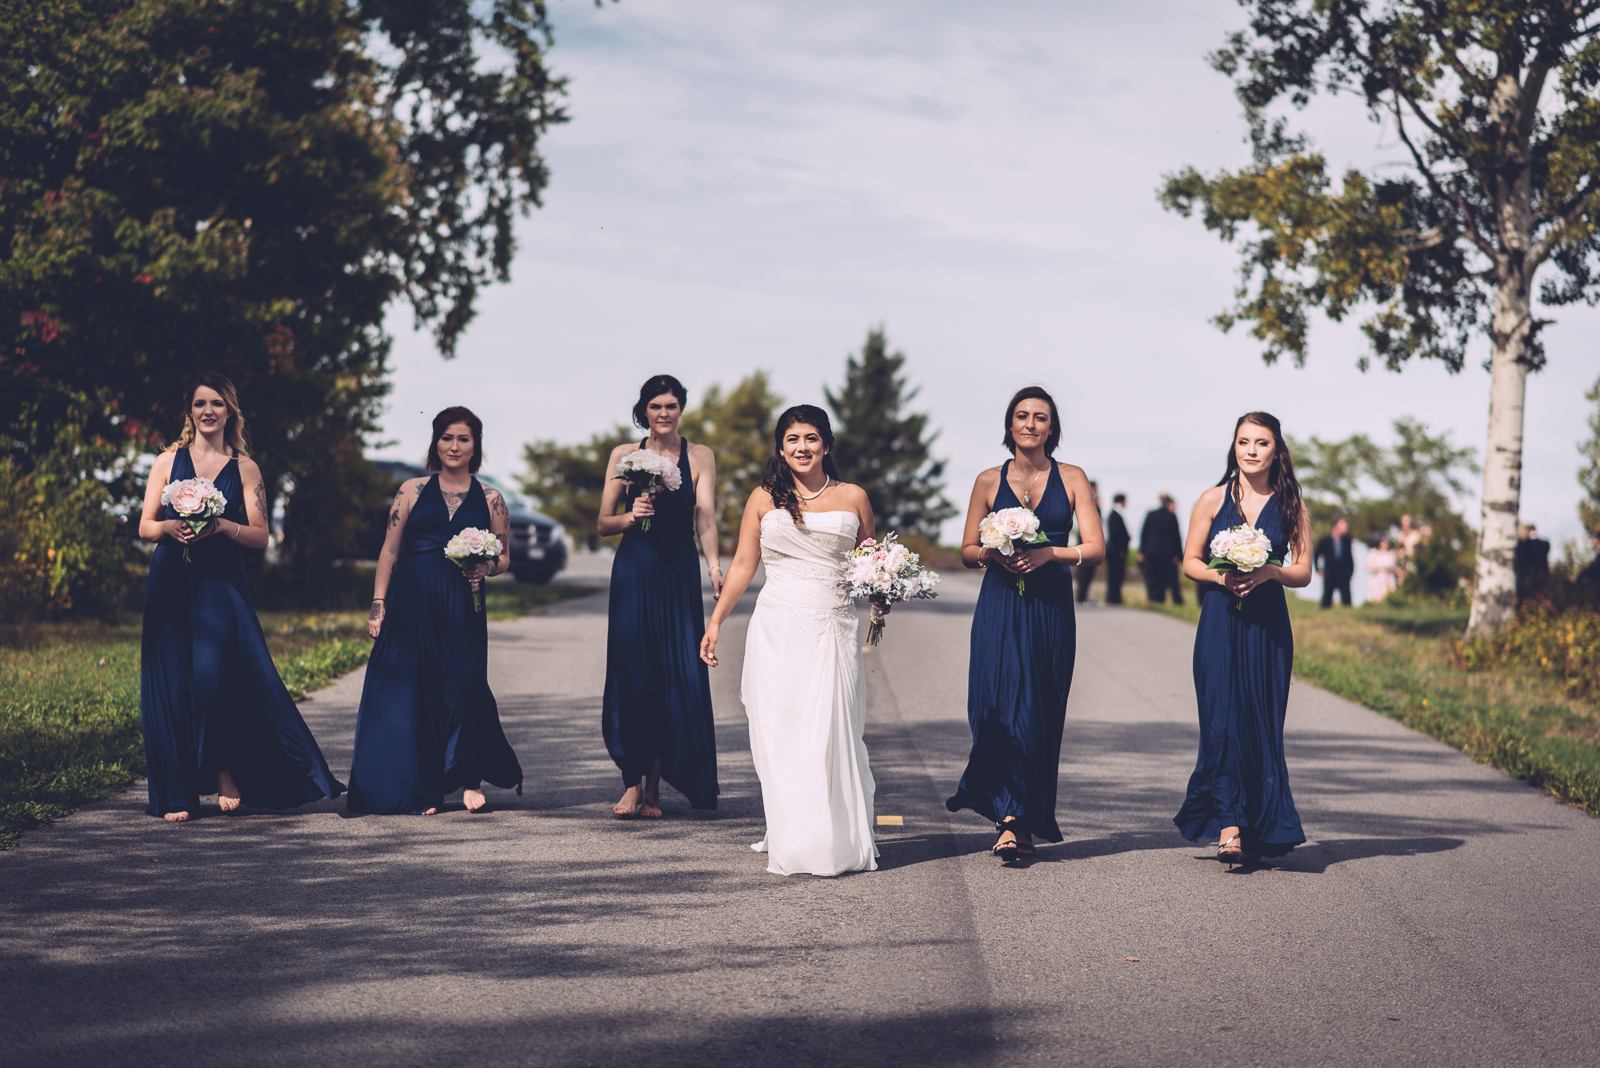 jamie_cory_wedding_blog66.jpg